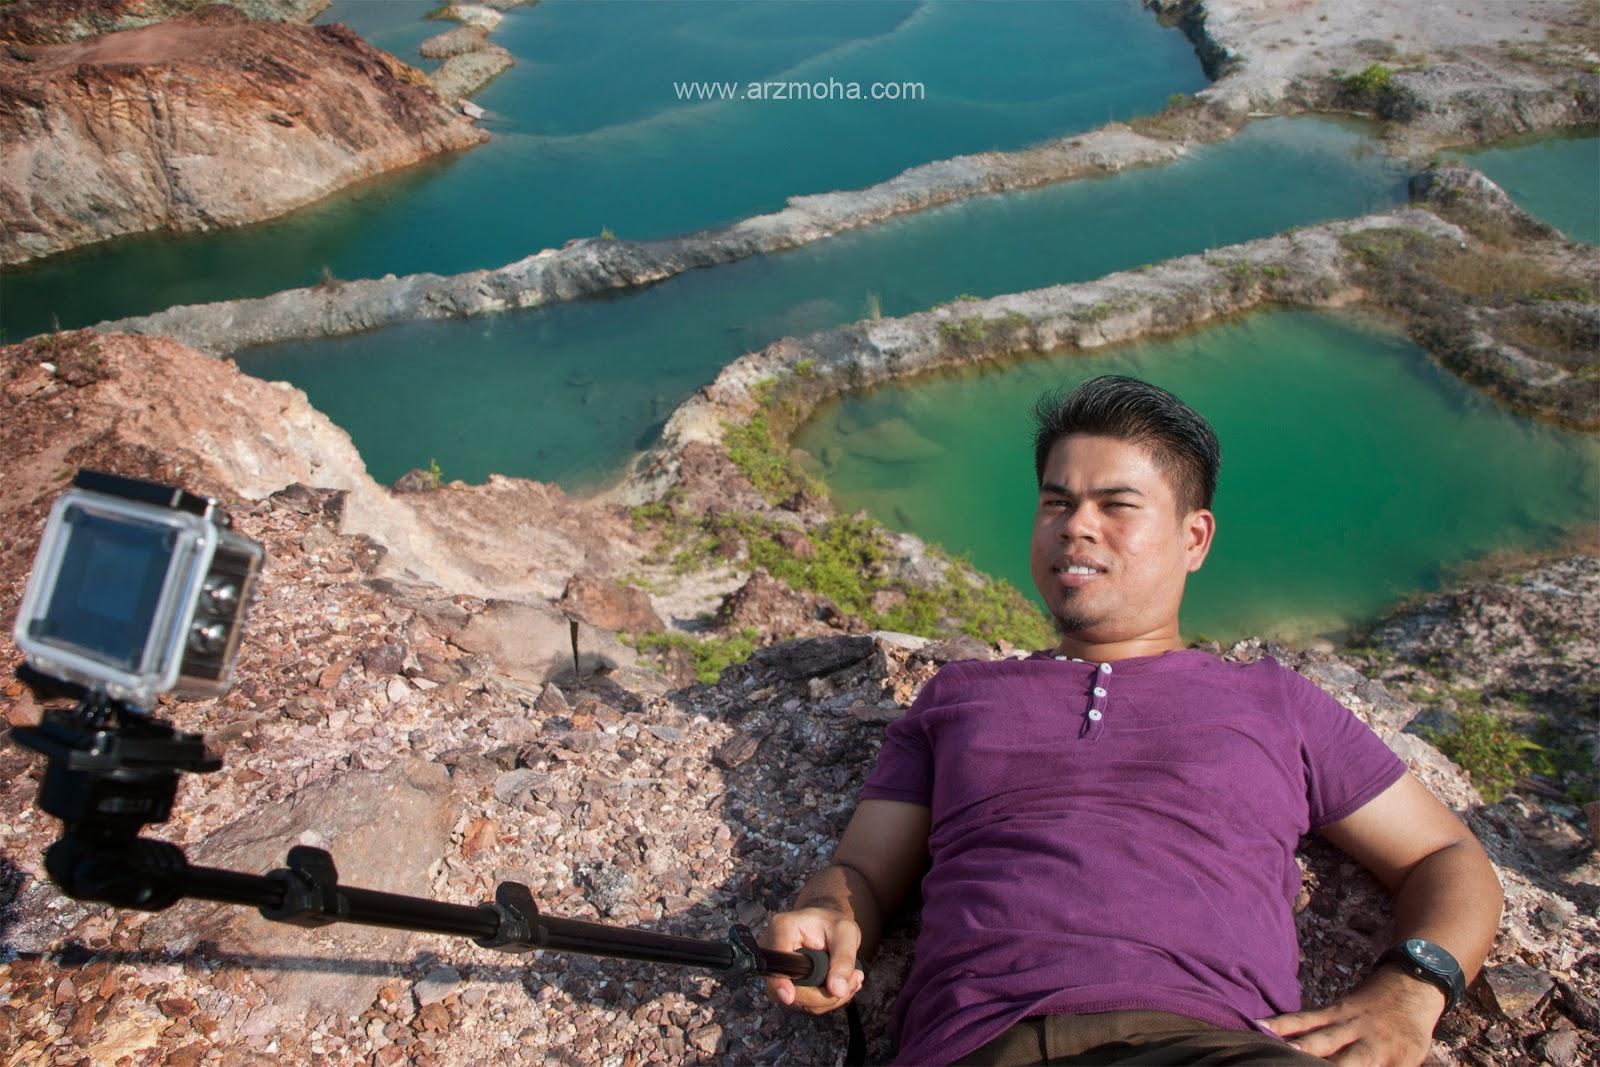 acara selfie, selfie, nice place, amazing plaze, penang, pulau pinang,